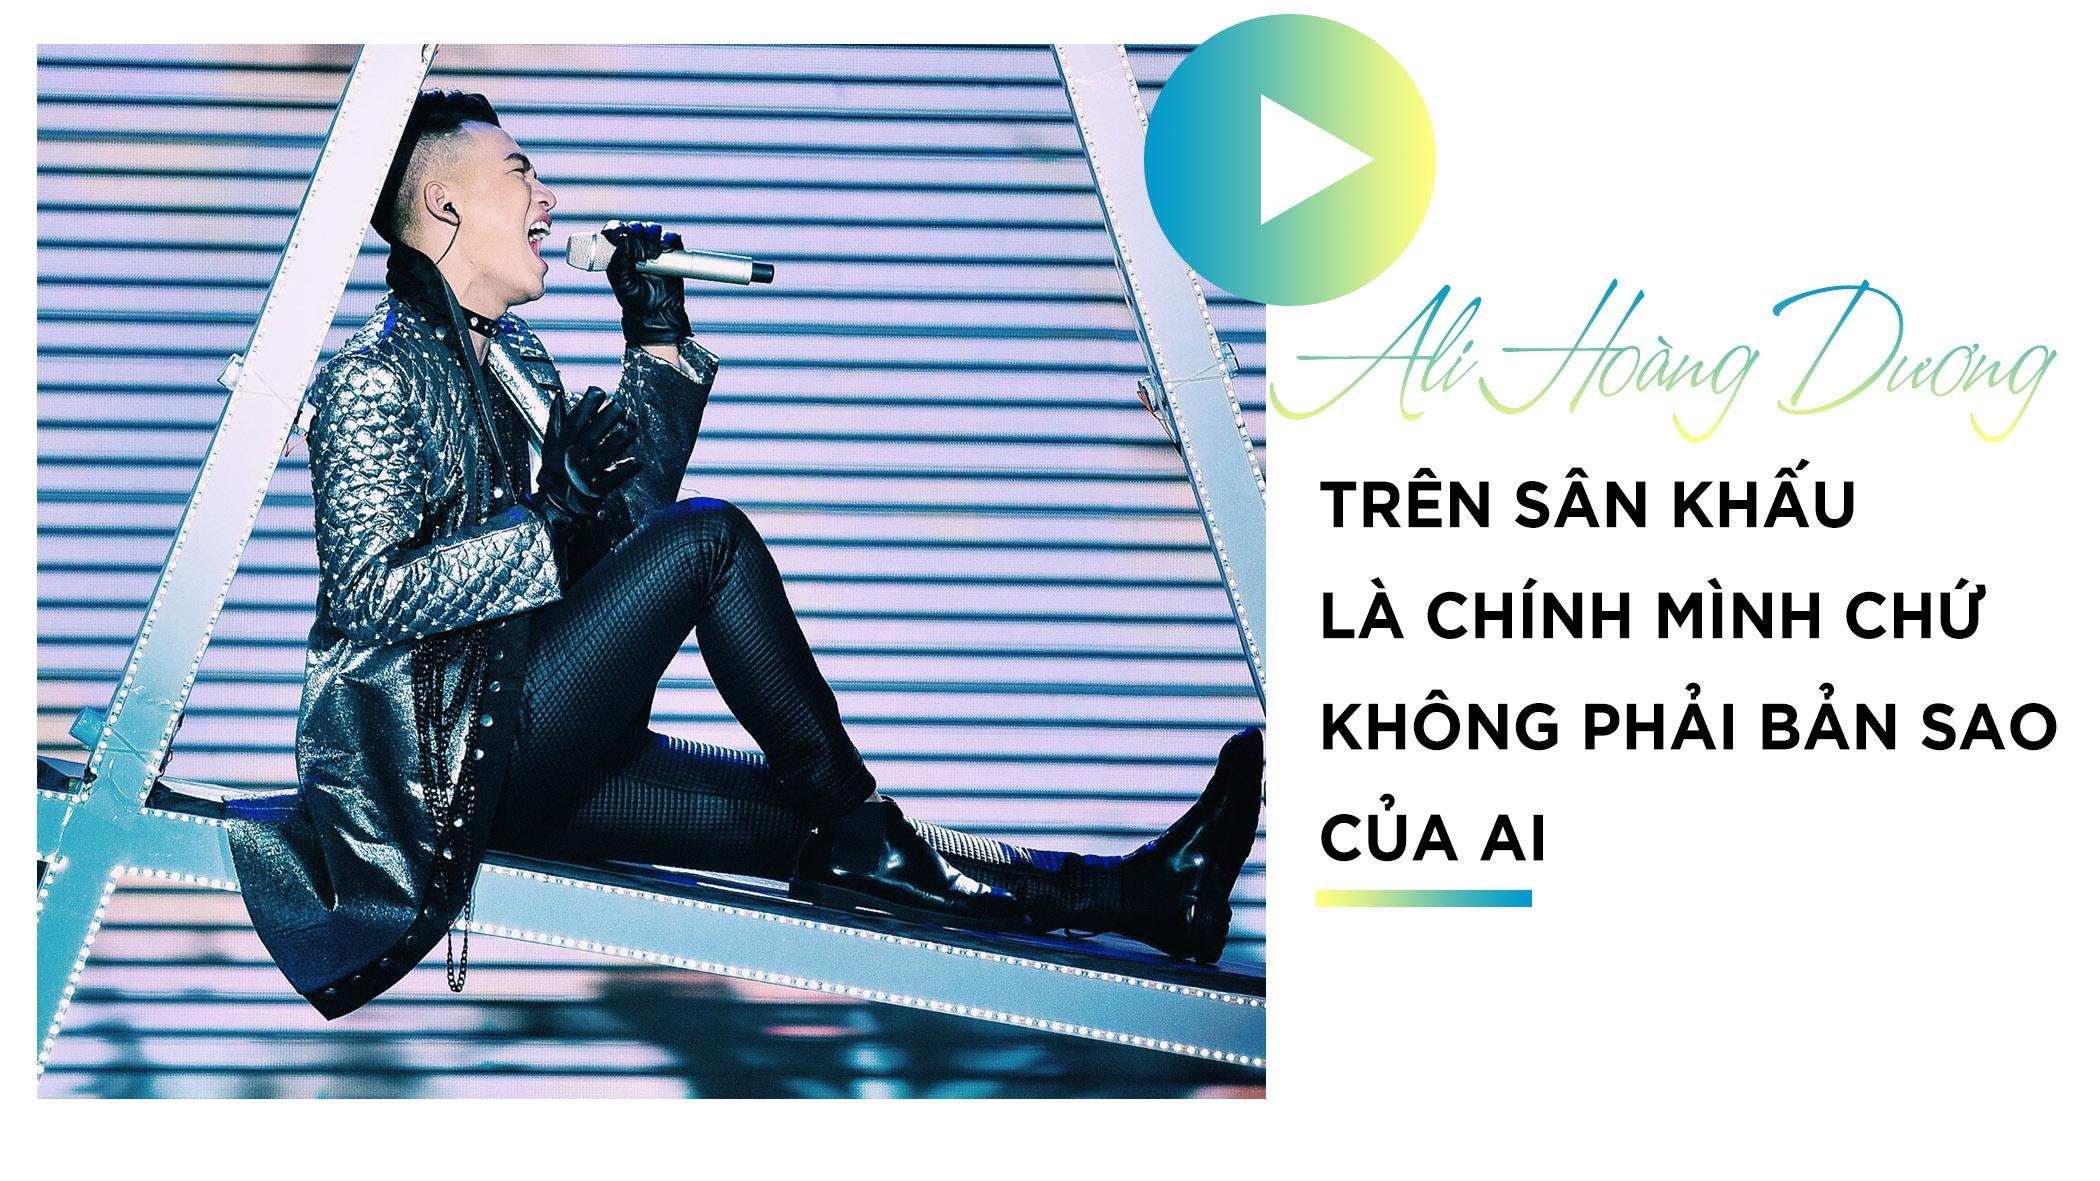 Ali Hoang Duong: 'Cat-xe cua toi tang vot sau The Voice' hinh anh 4